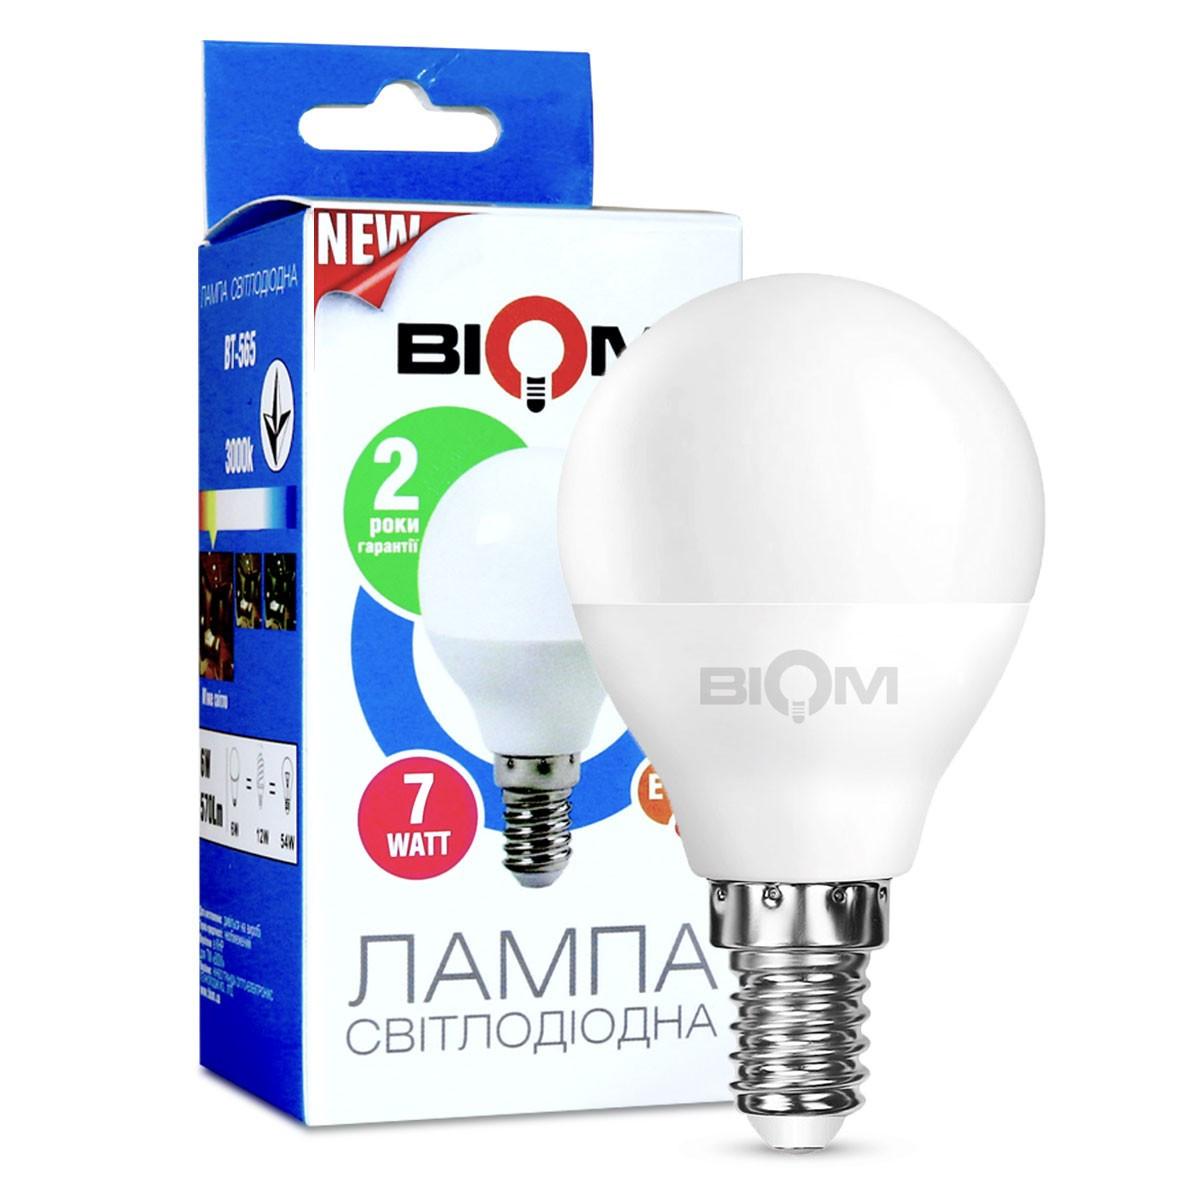 LED Лампа Biom G45 7W E14 4200K BT-566